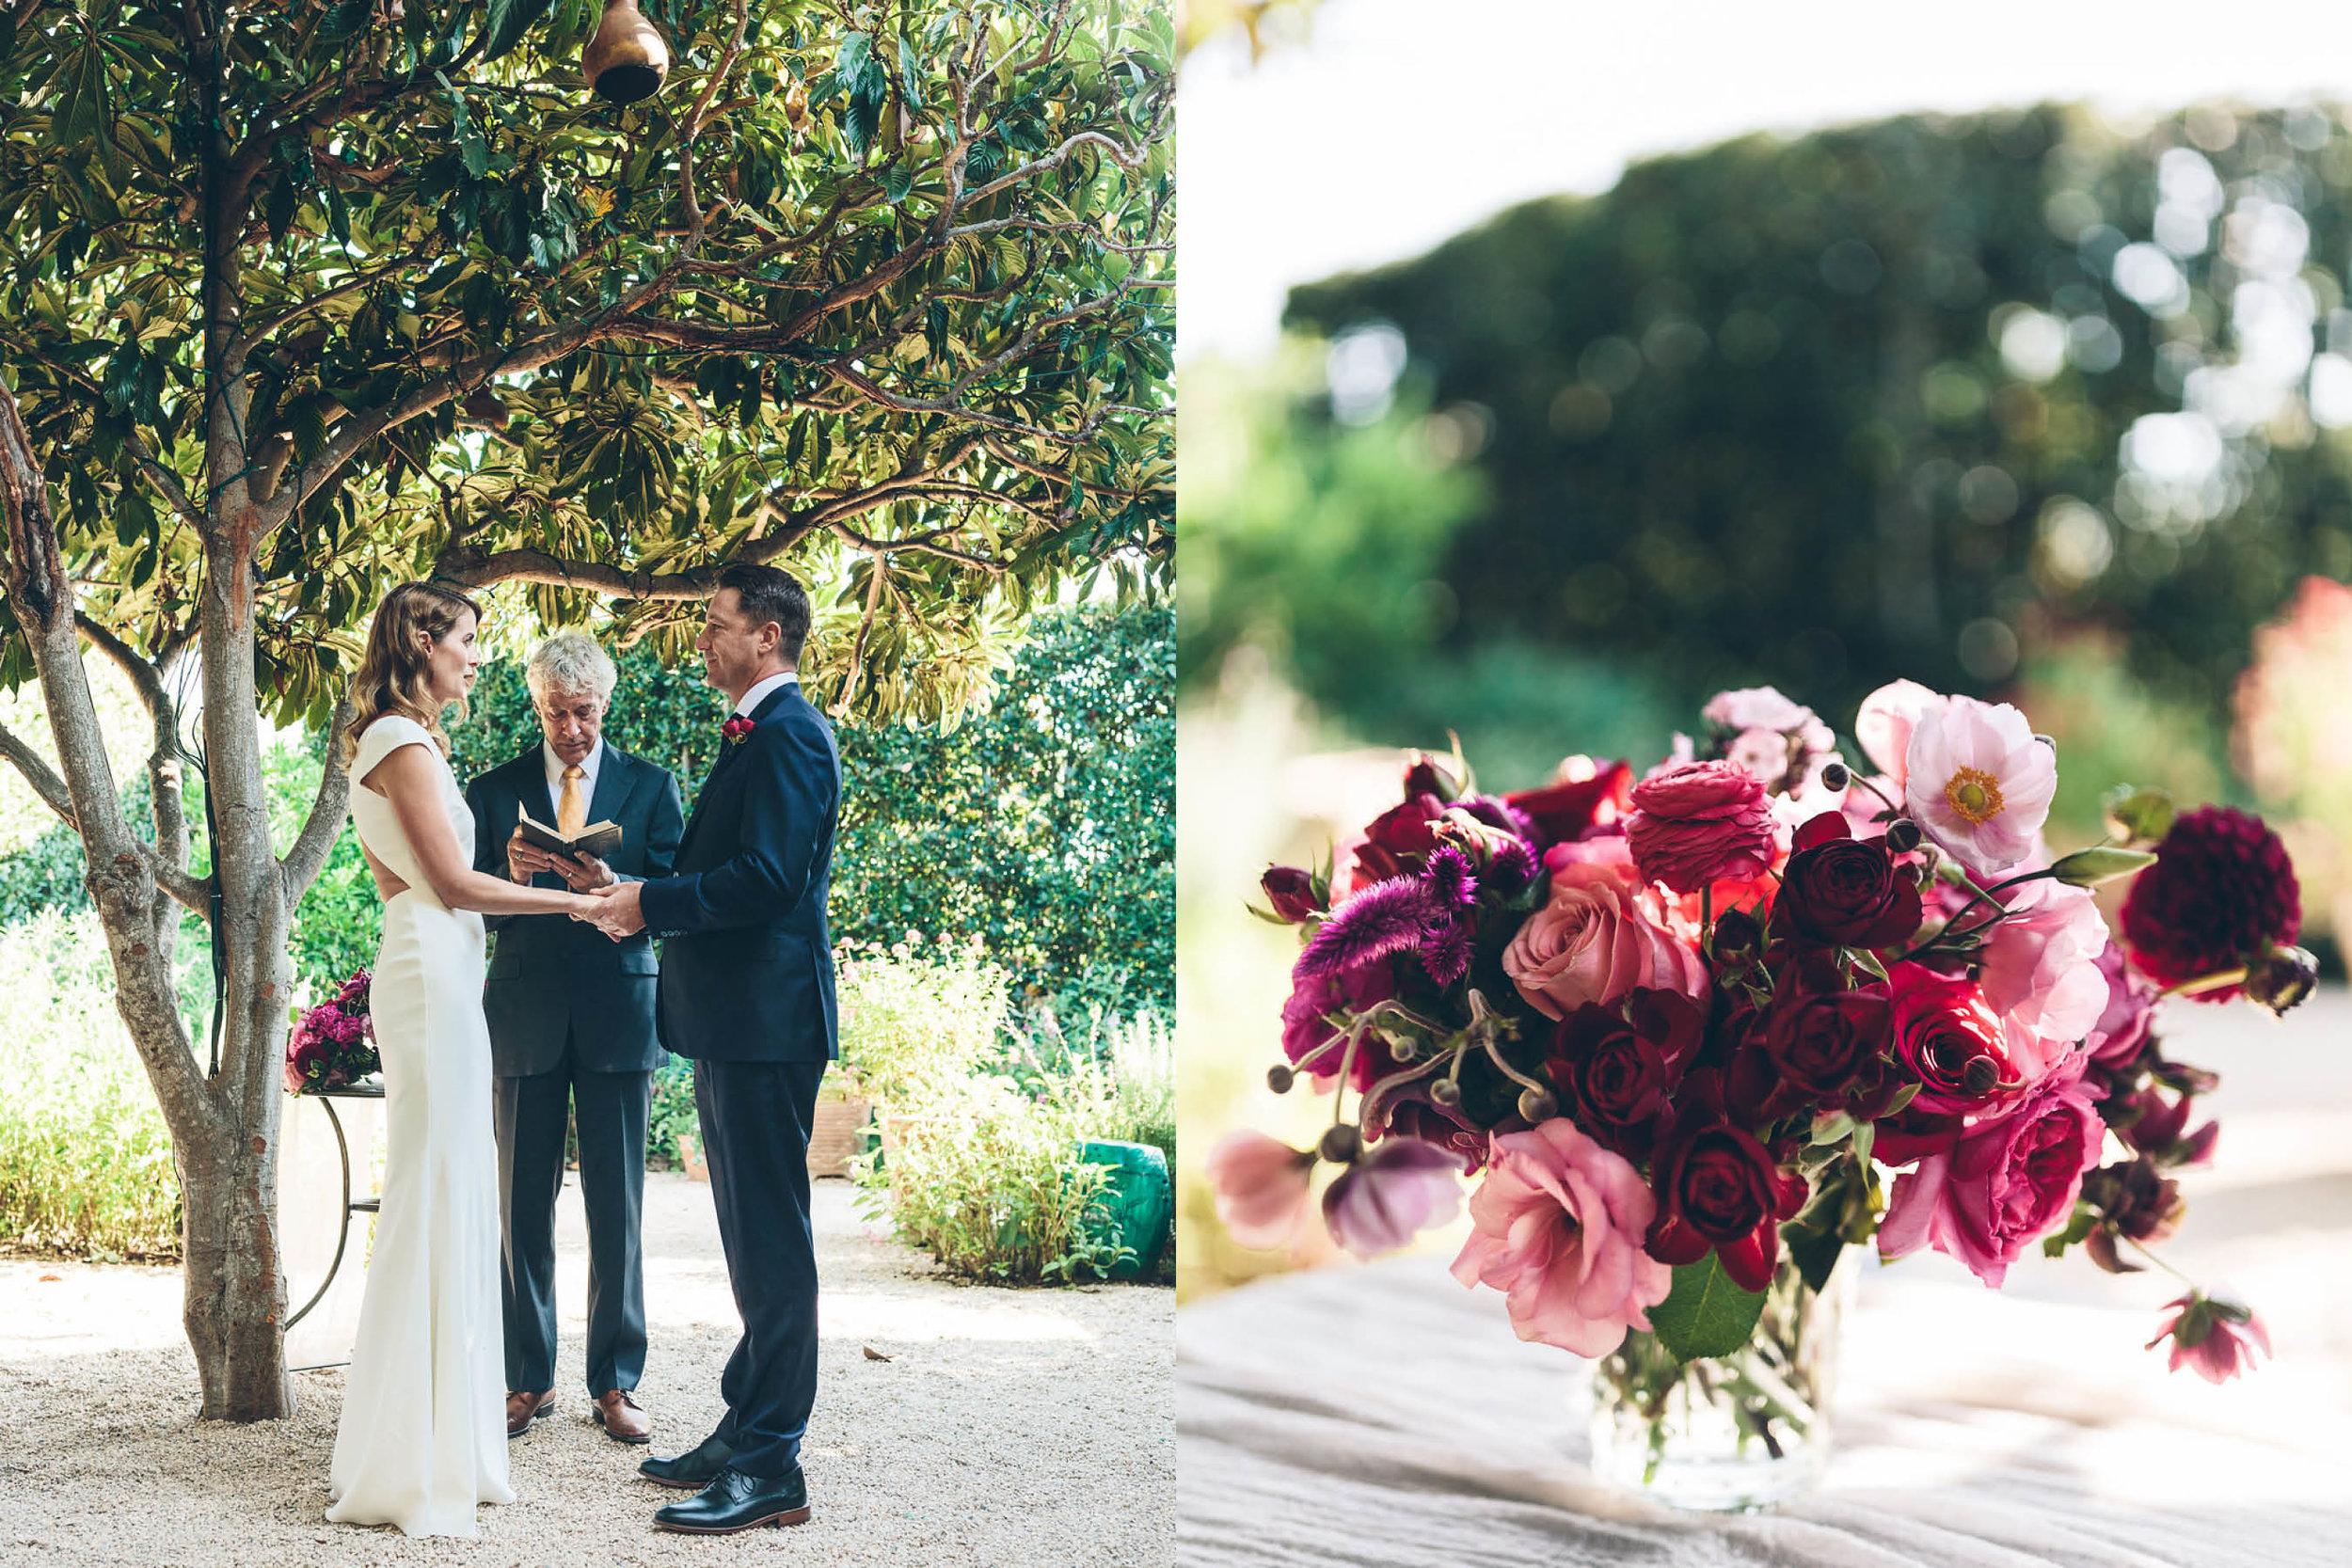 san-ysidro-ranch-wedding-elope-elopement-montecito-santa-barbara-planner-planning-coordinator-design-day-of-lavender-garden-purple-red-vintage-car-bubbles (8).jpg